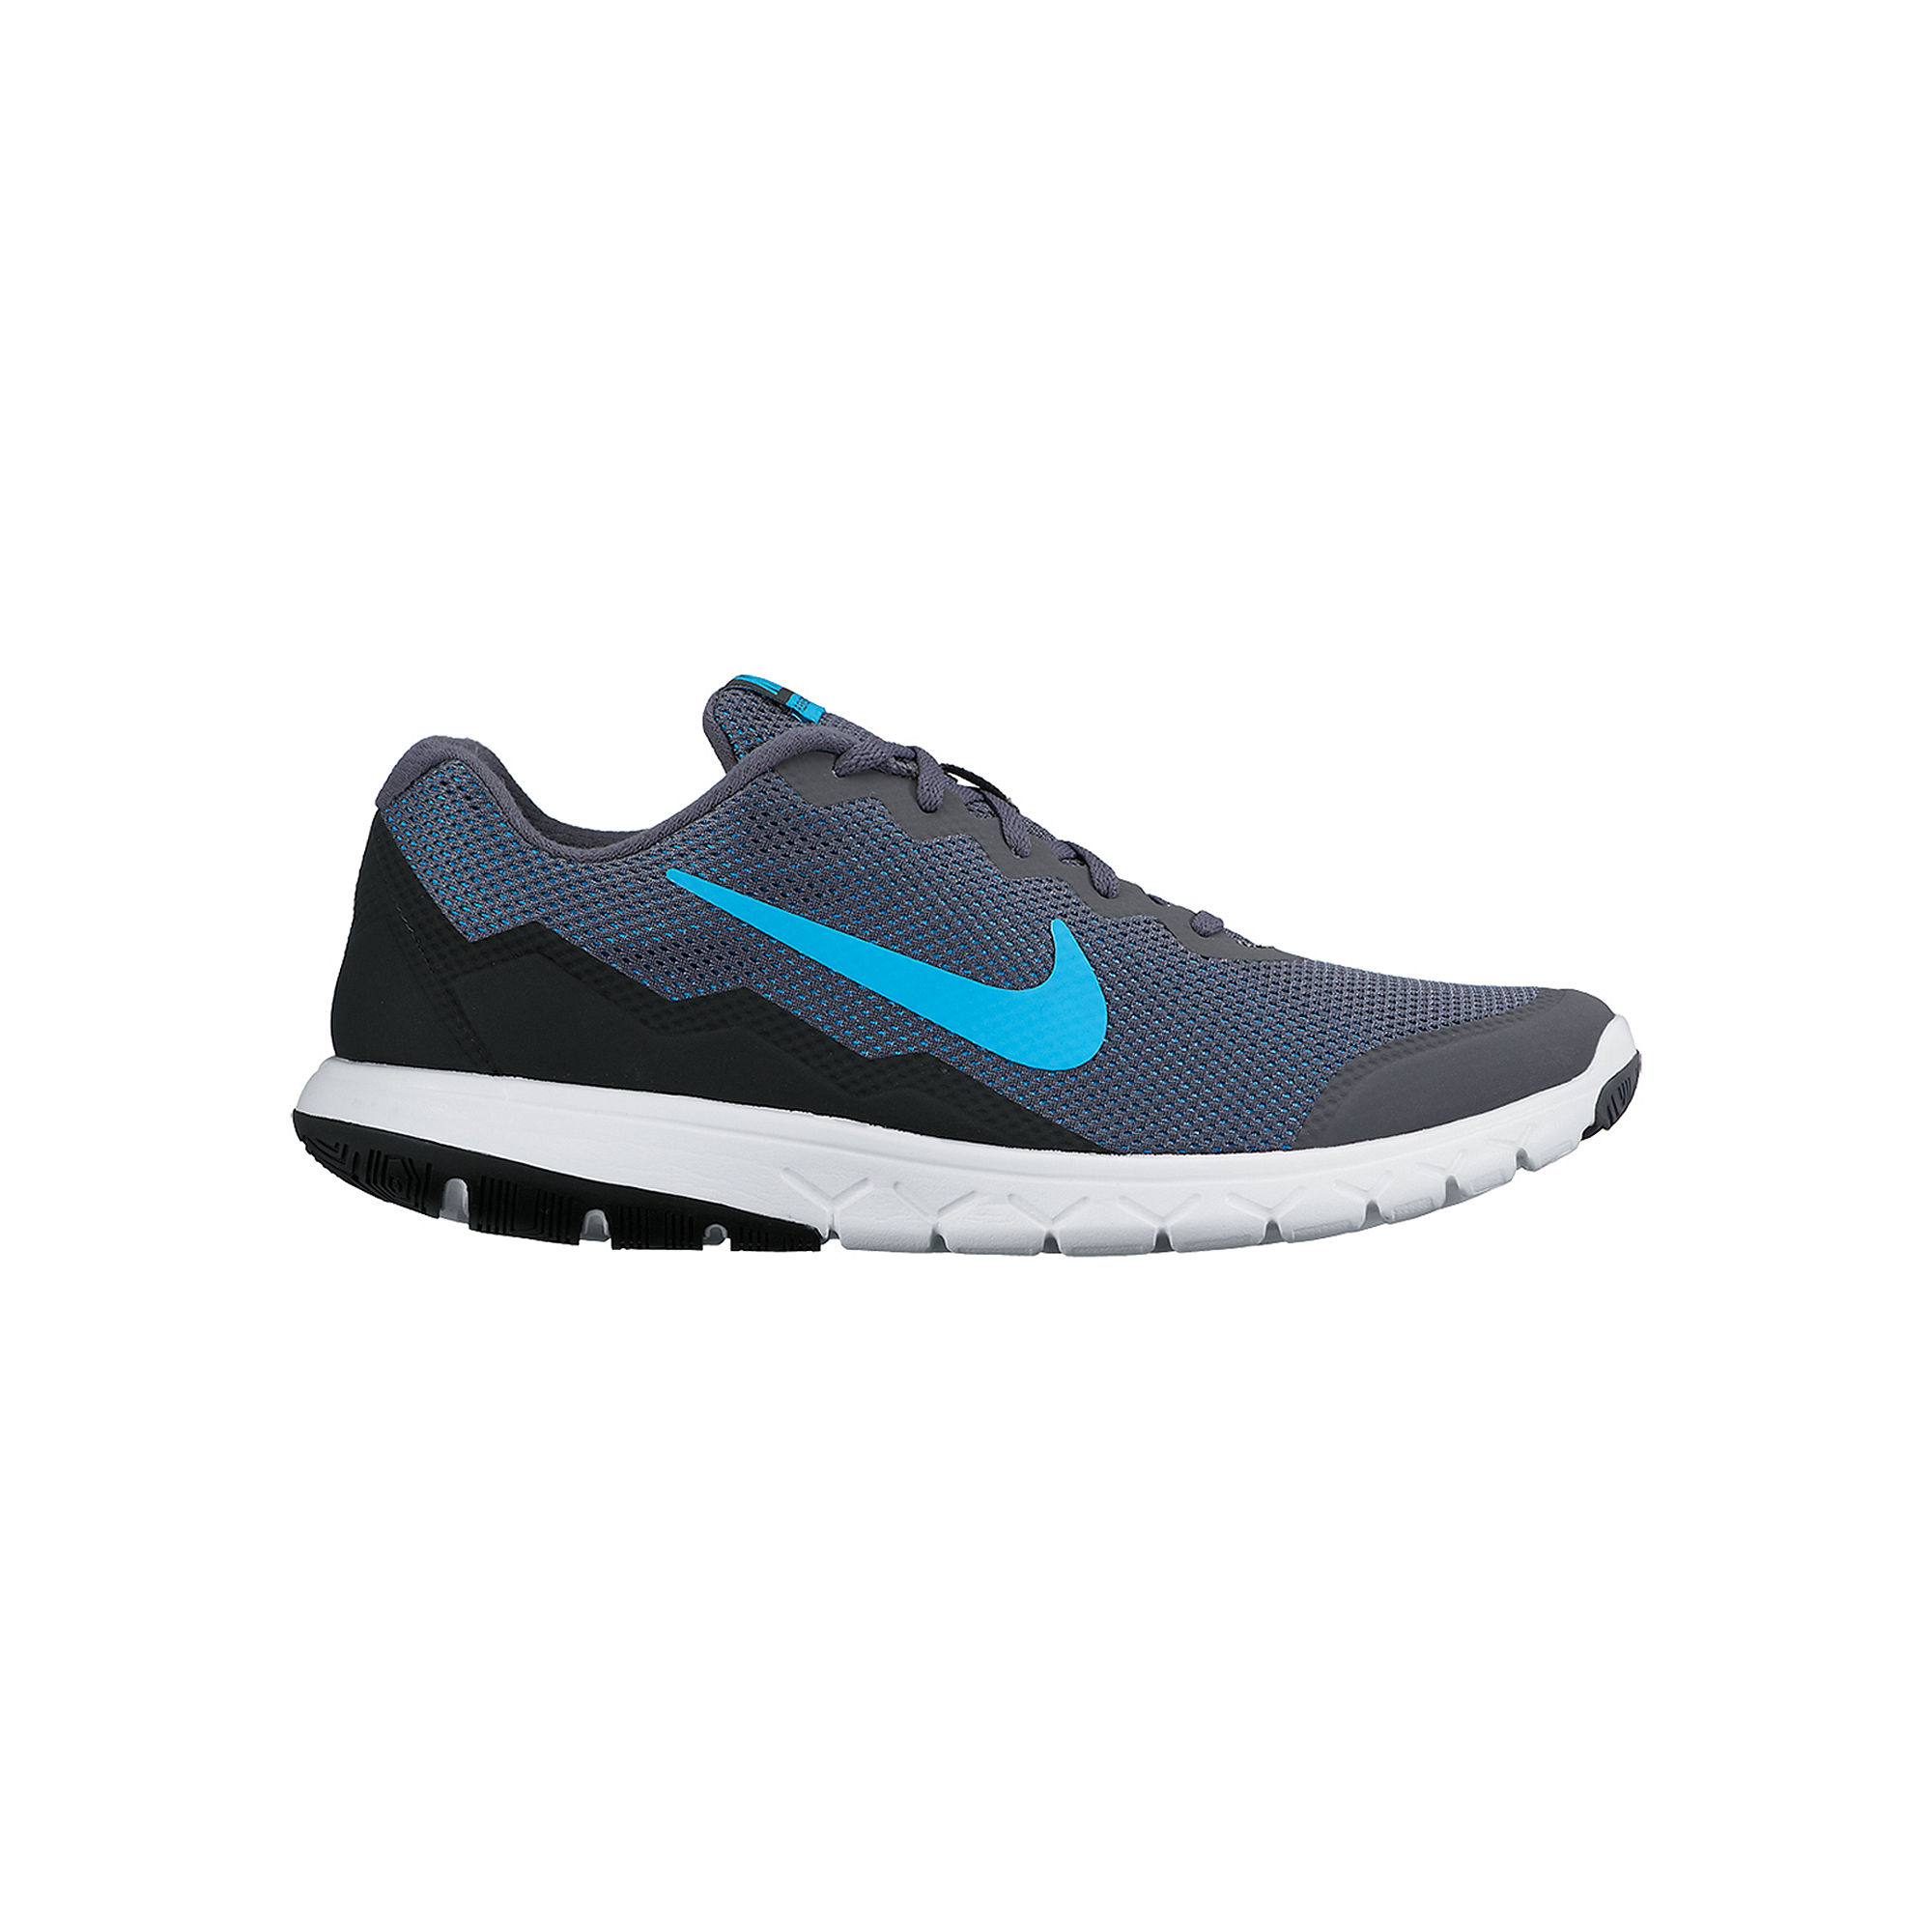 4b3e04bb19aa7 ... nike kaishi run jcpenney ... Nike® Revolution 2 Womens Running Shoes ...